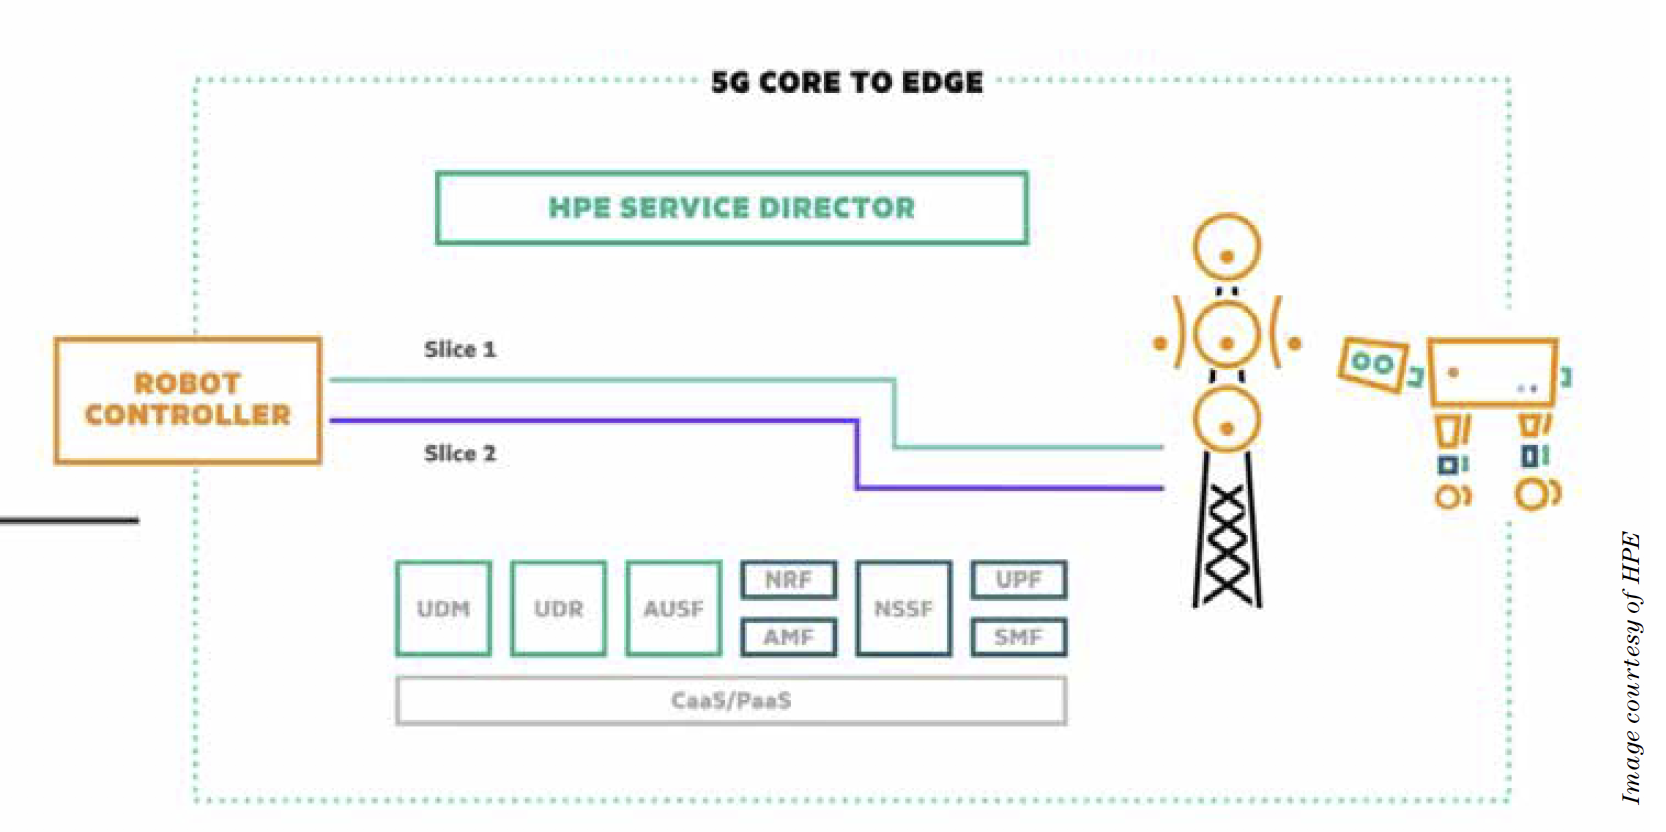 5G Core to Edge